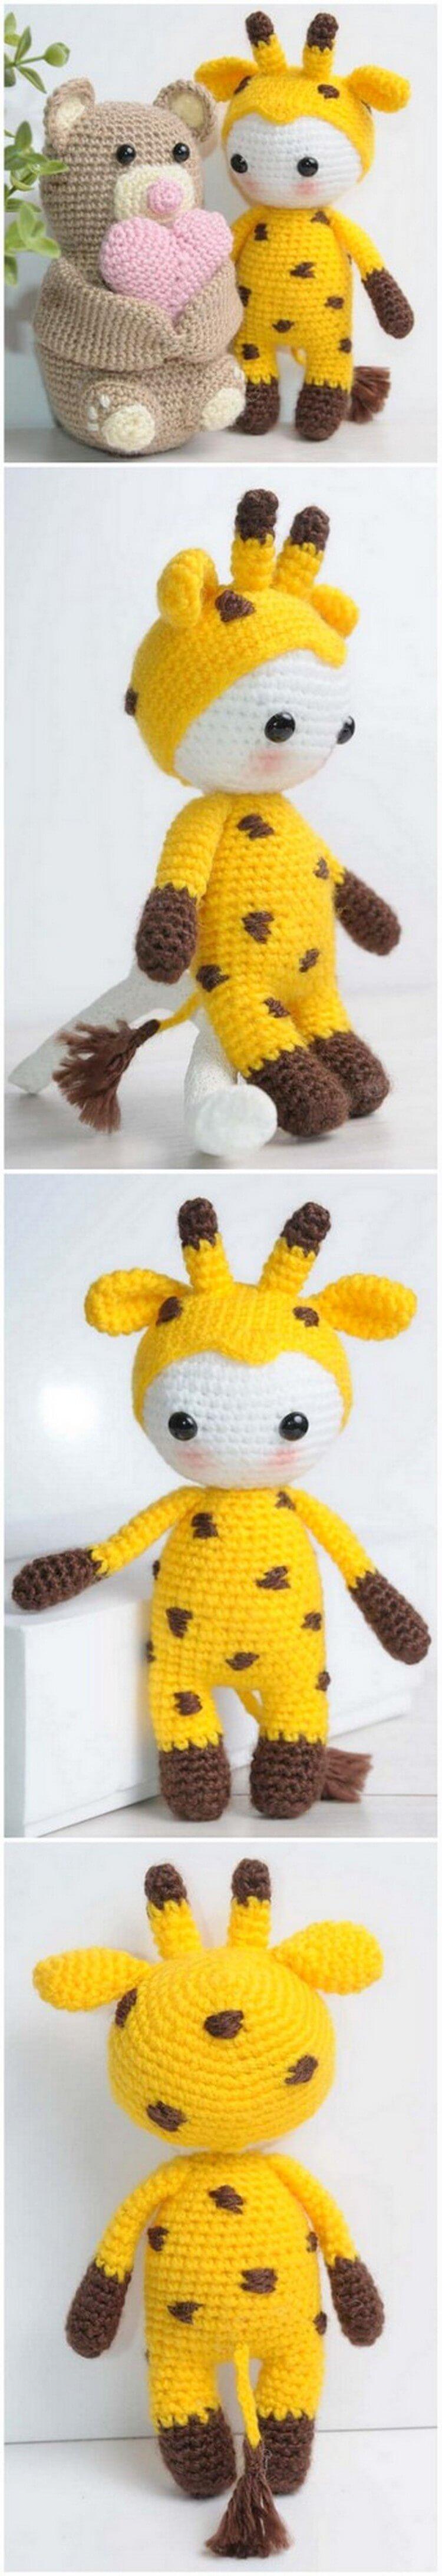 Crochet Amigurumi Pattern (41)